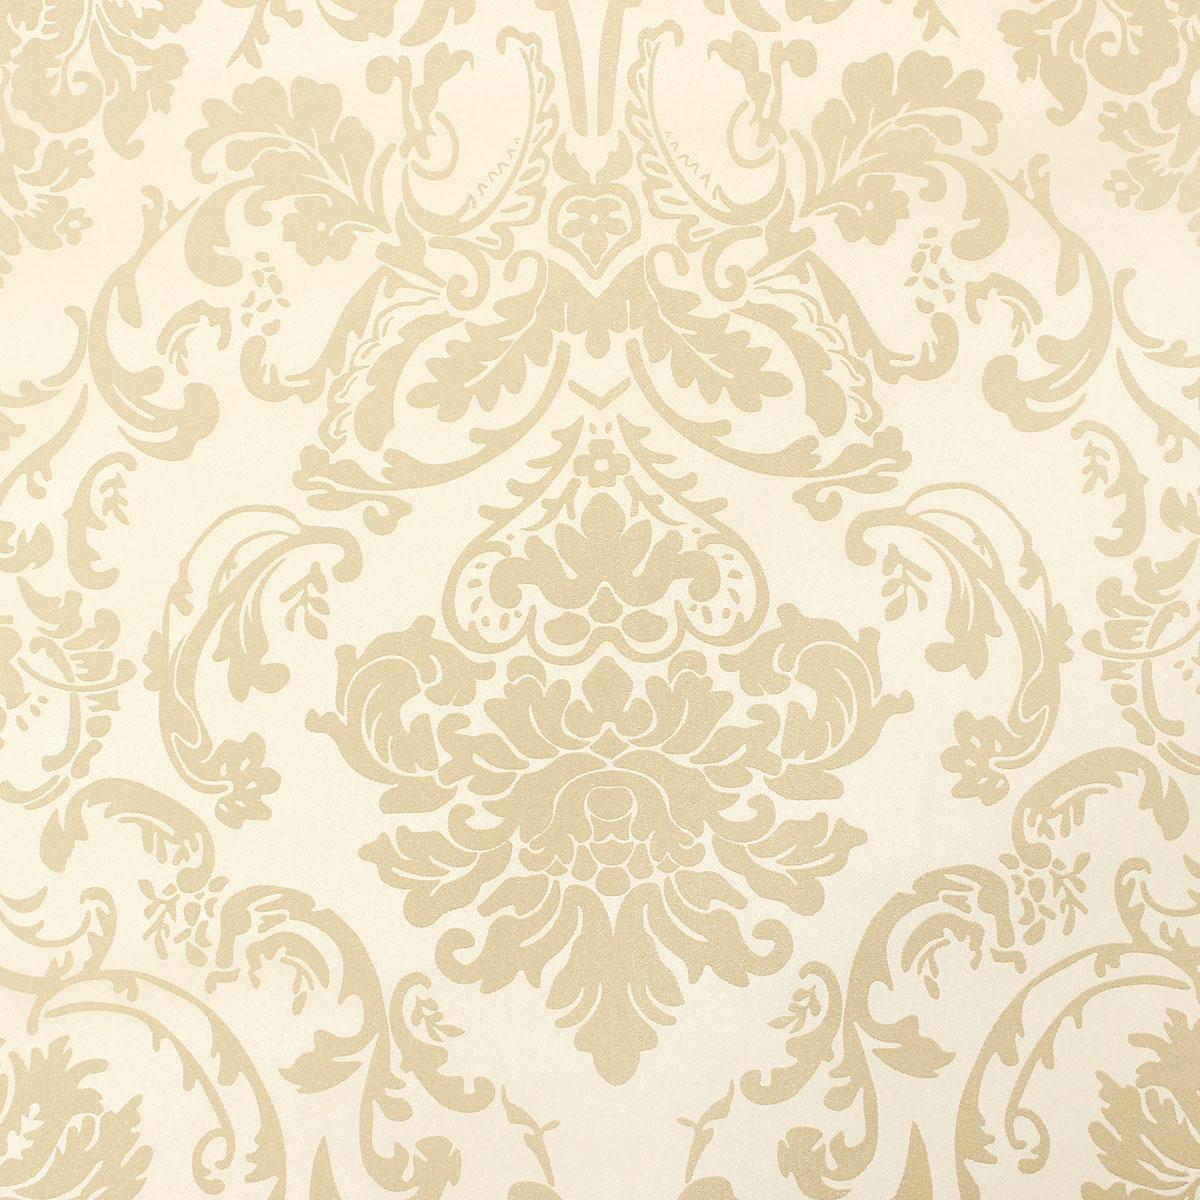 10m retro 3d floral damask textured embossed wallpaper for 3d embossed wallpaper